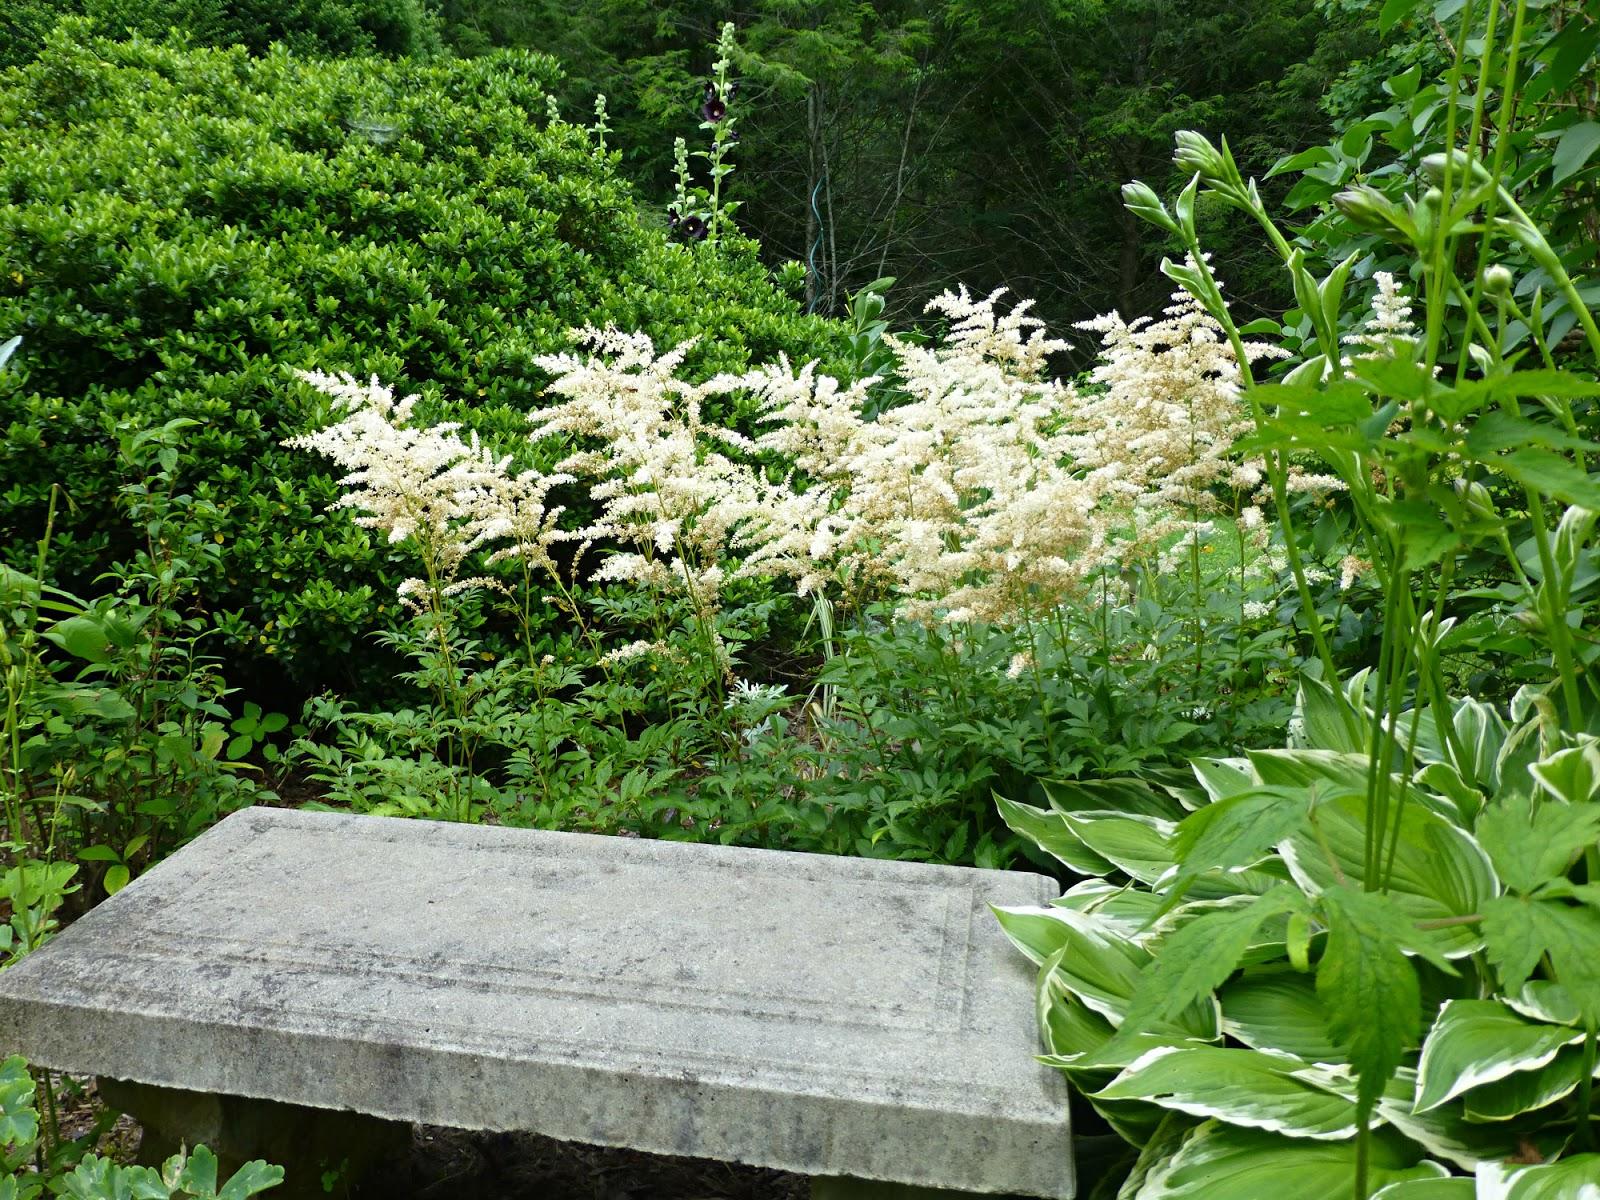 Black and White Garden June 2015 Update on hosta and daylily garden, hosta and caladium garden, hosta garden plans blueprints, hosta and hydrangea garden,